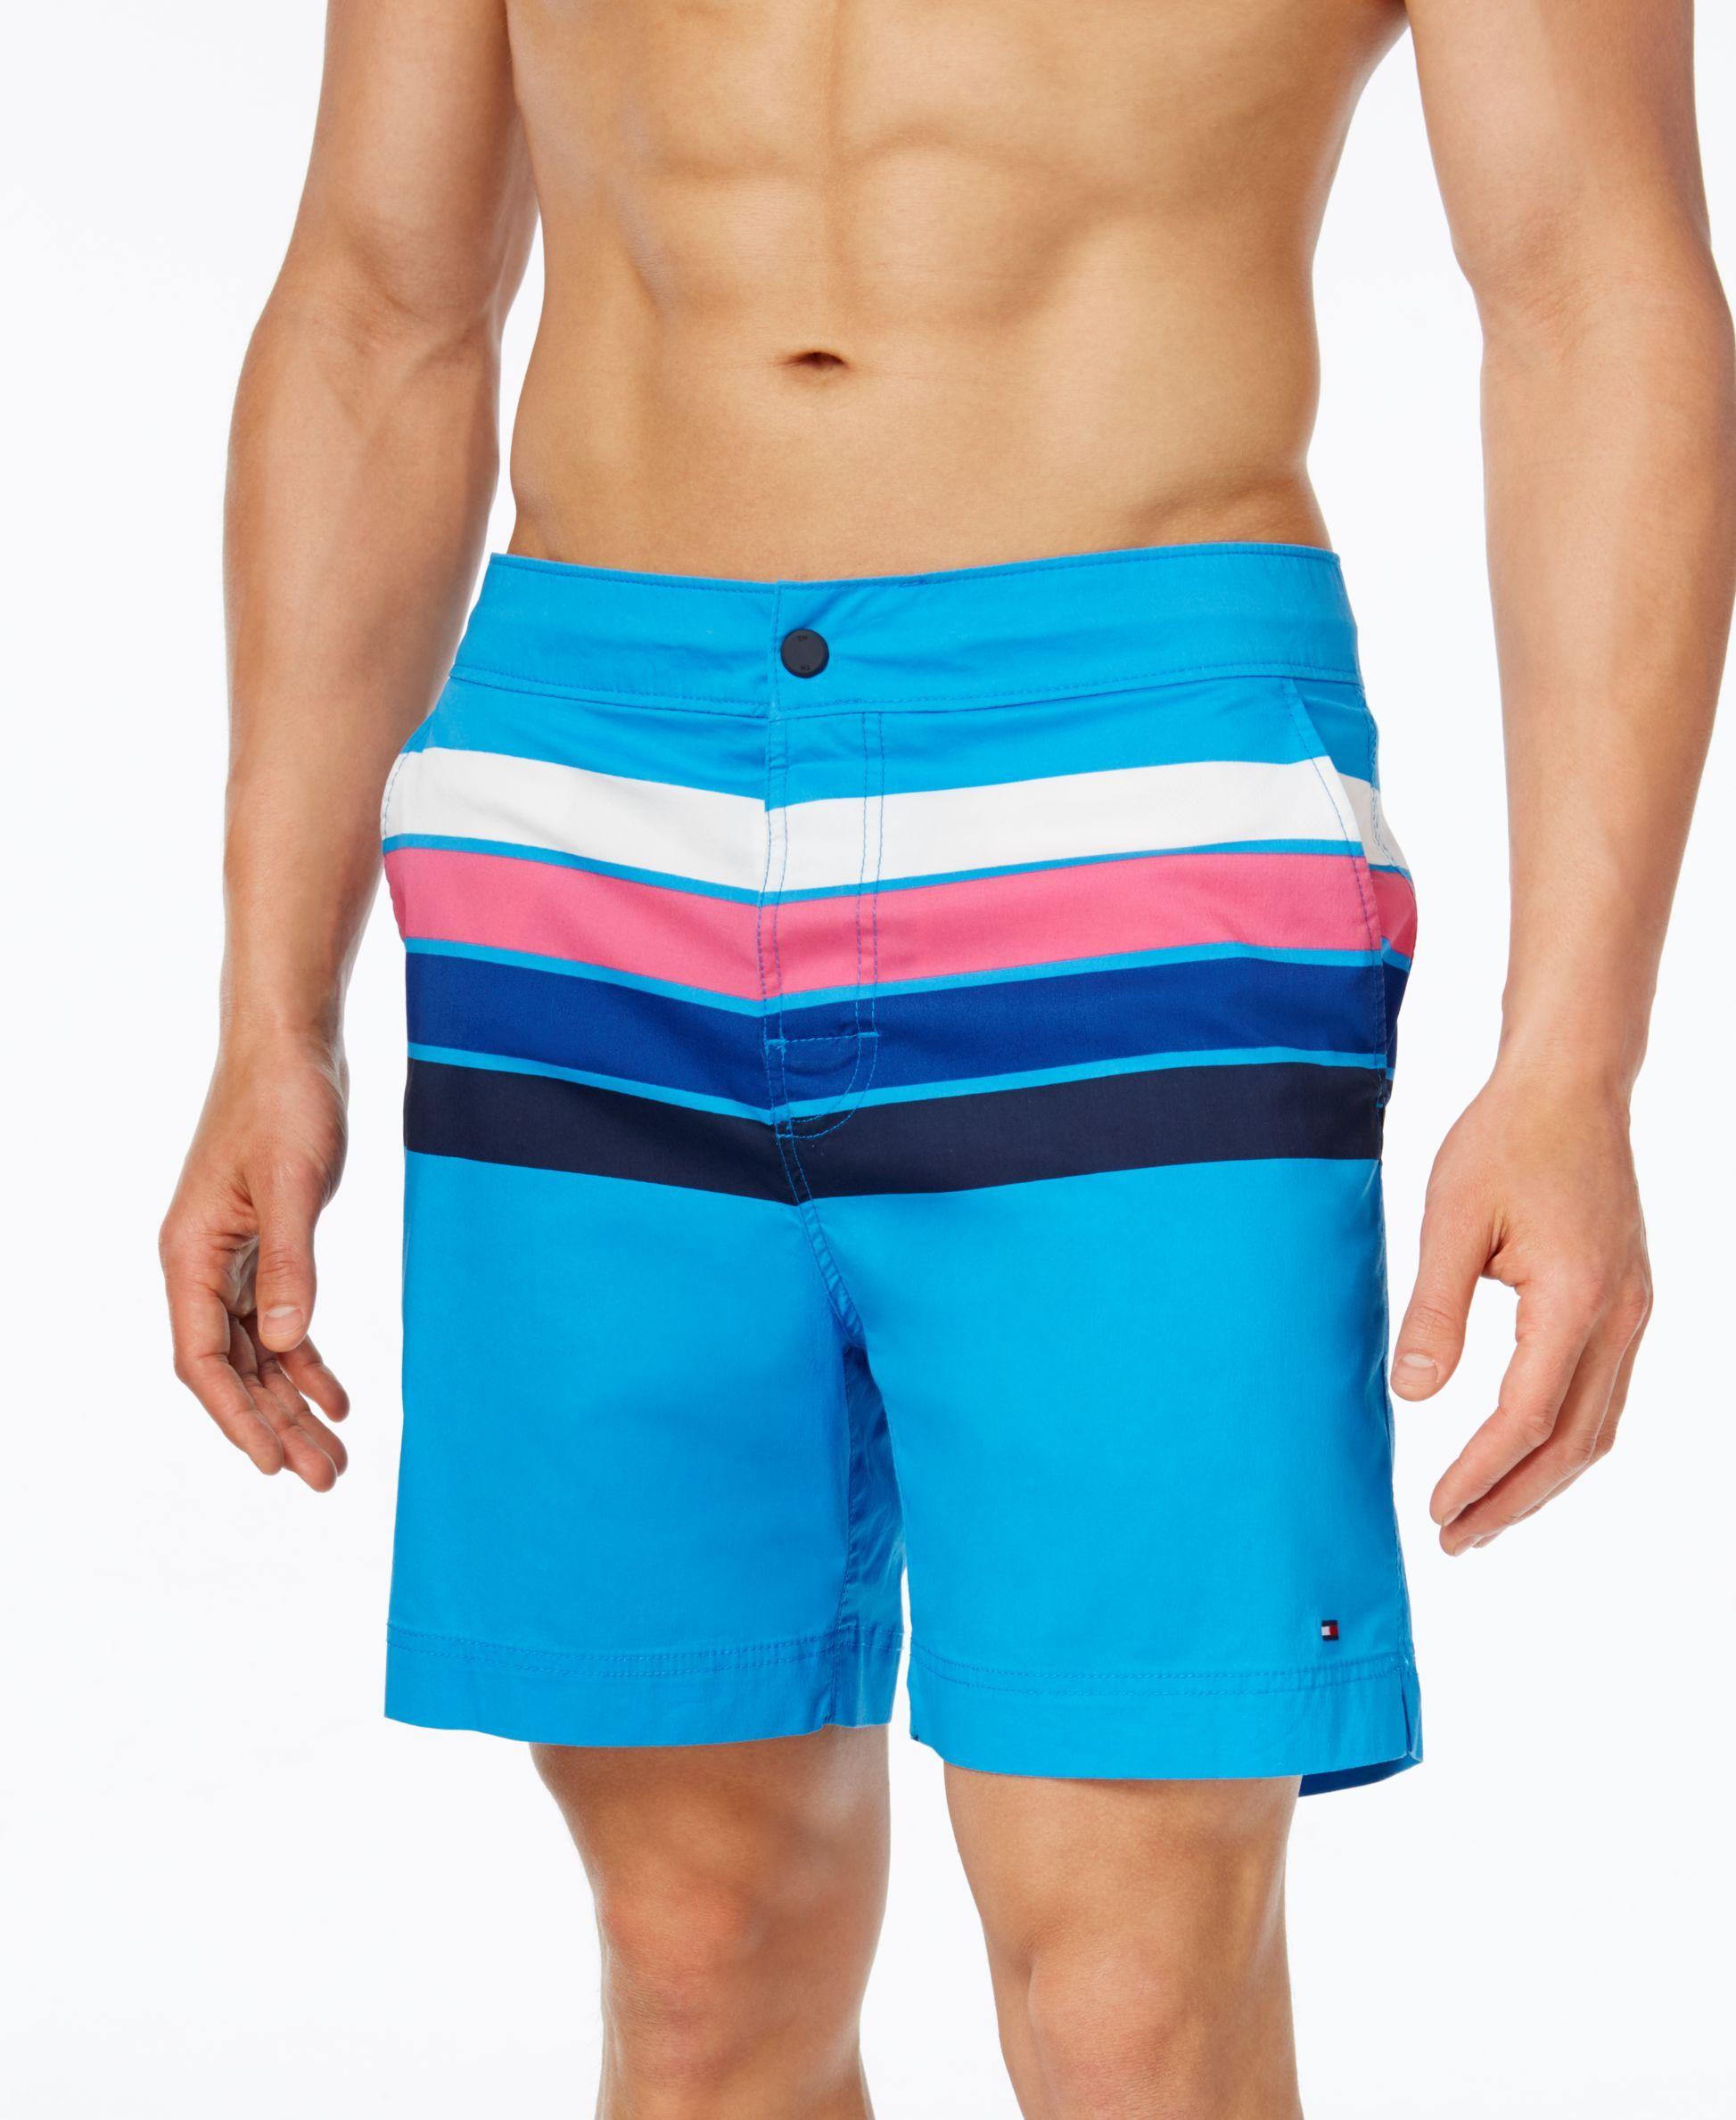 030dd4451c Tommy Hilfiger Men's Sunset Stripe Board Shorts | Products | Tommy ...